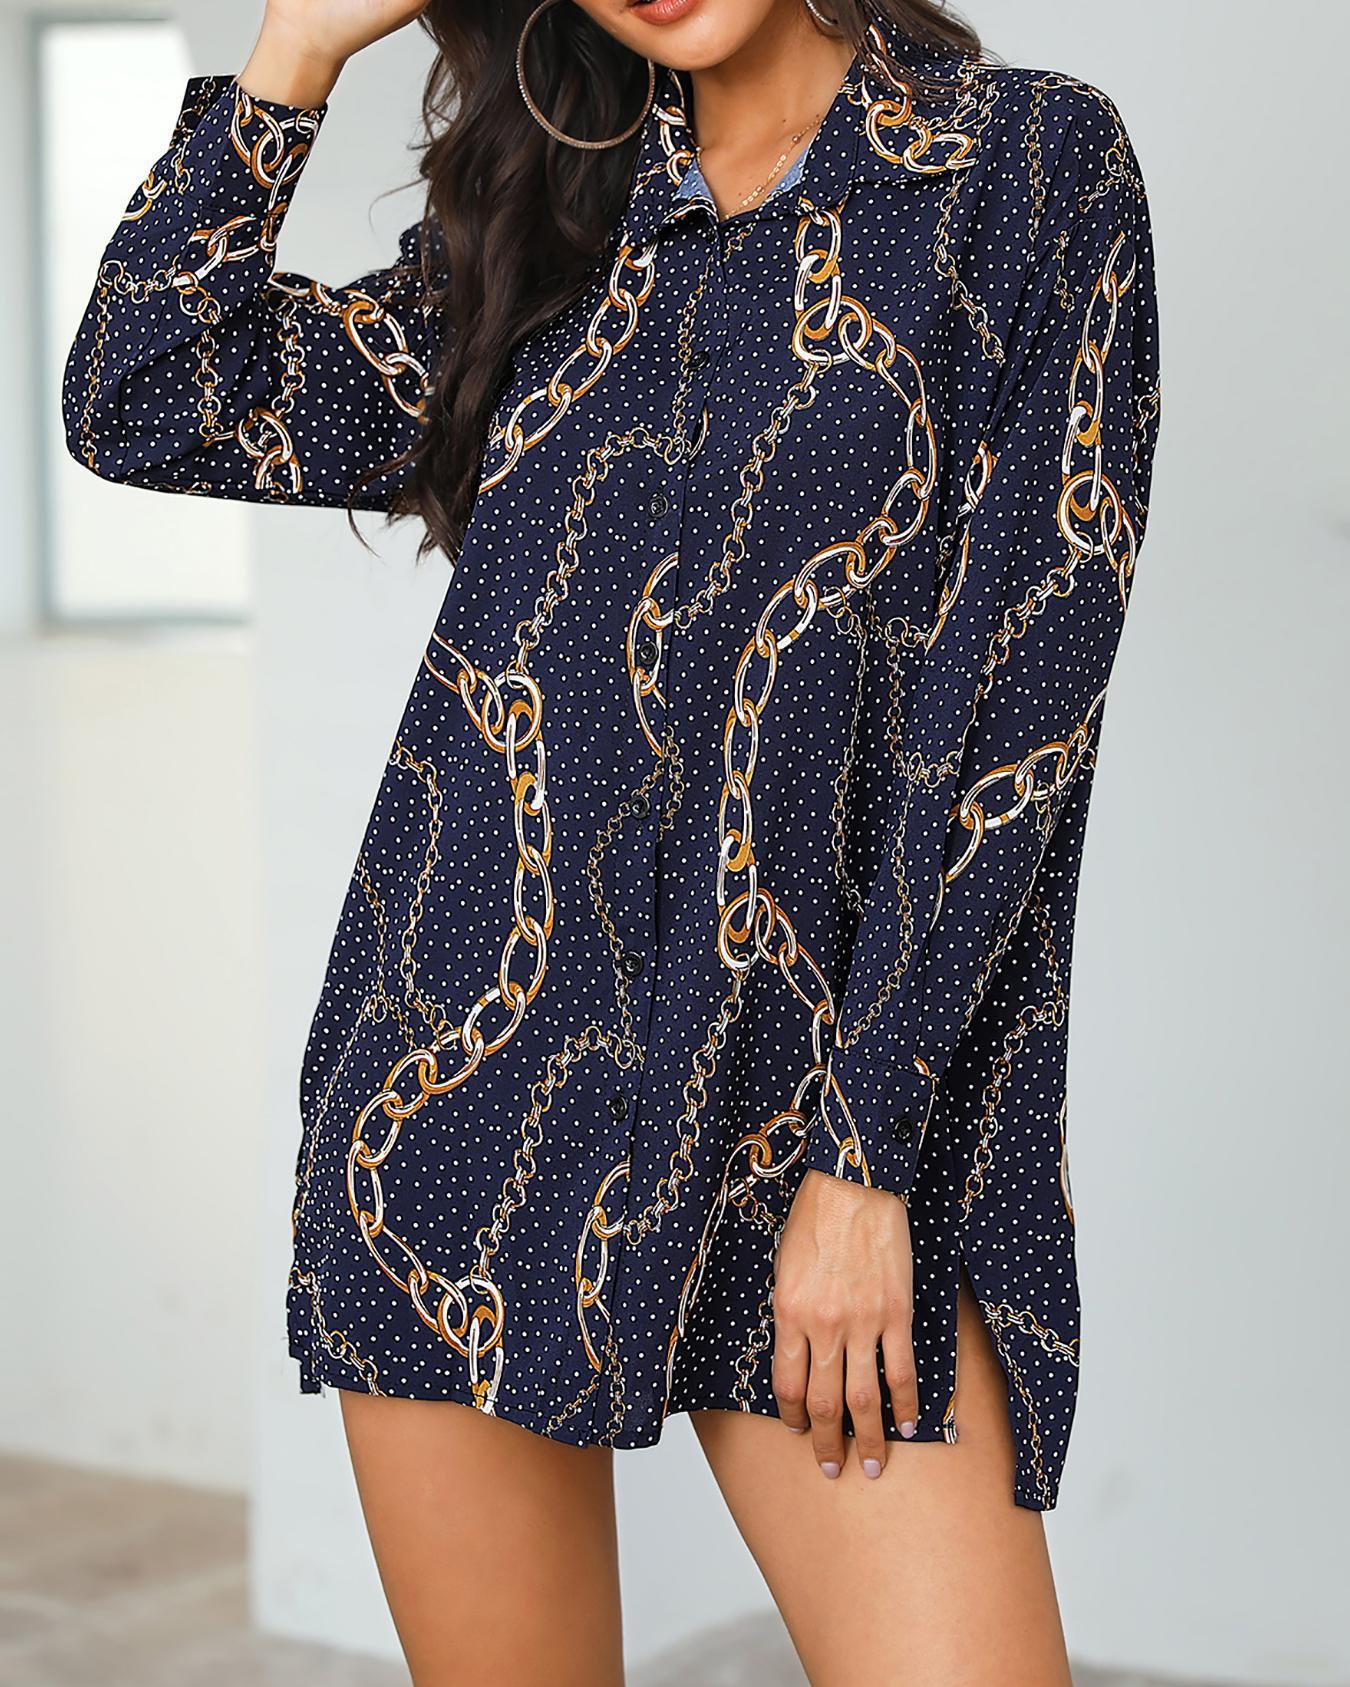 boutiquefeel / Dots & Chains Imprimir Side Slit Shirt Dress